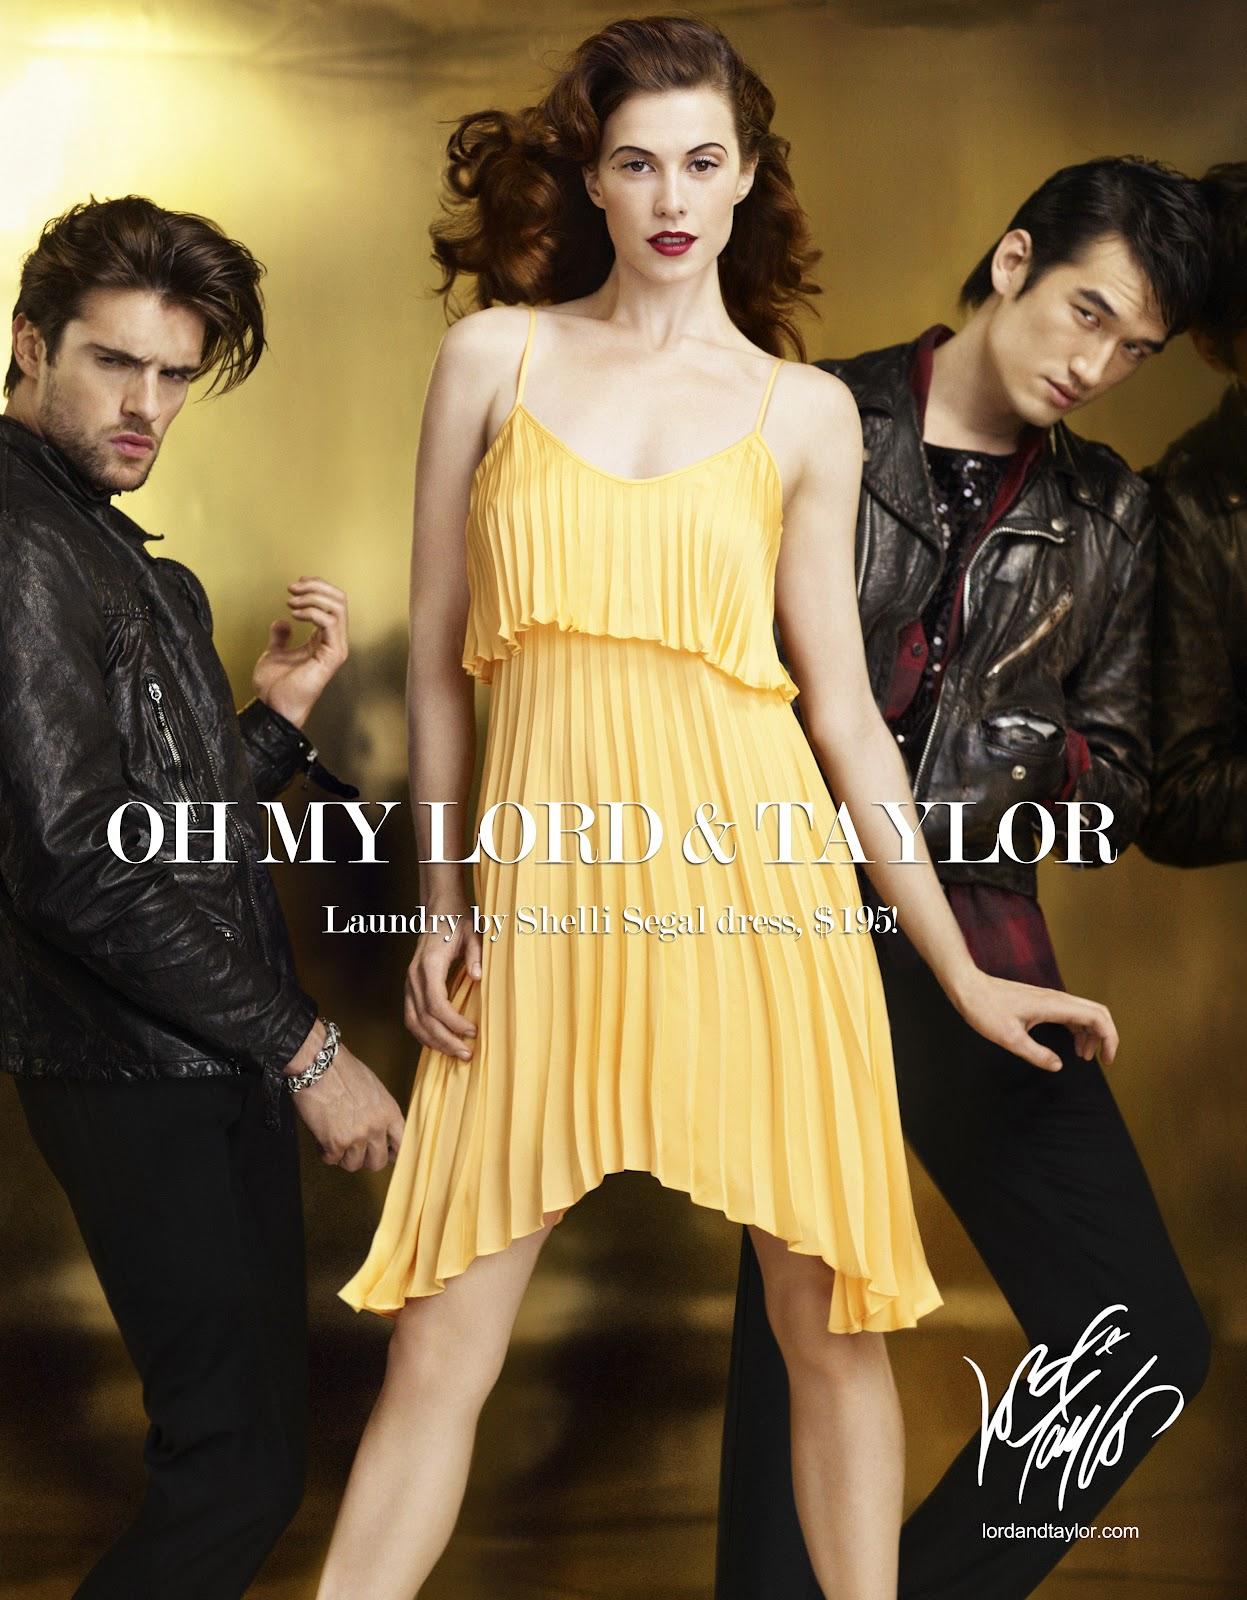 http://3.bp.blogspot.com/-74x1o1B9U9A/T2TEu0YxT0I/AAAAAAAAYeQ/U_jE5zduIUI/s1600/Tony+Chung+-+Lord+%26+Taylor+Spring+Summer+2012+-+1.jpg